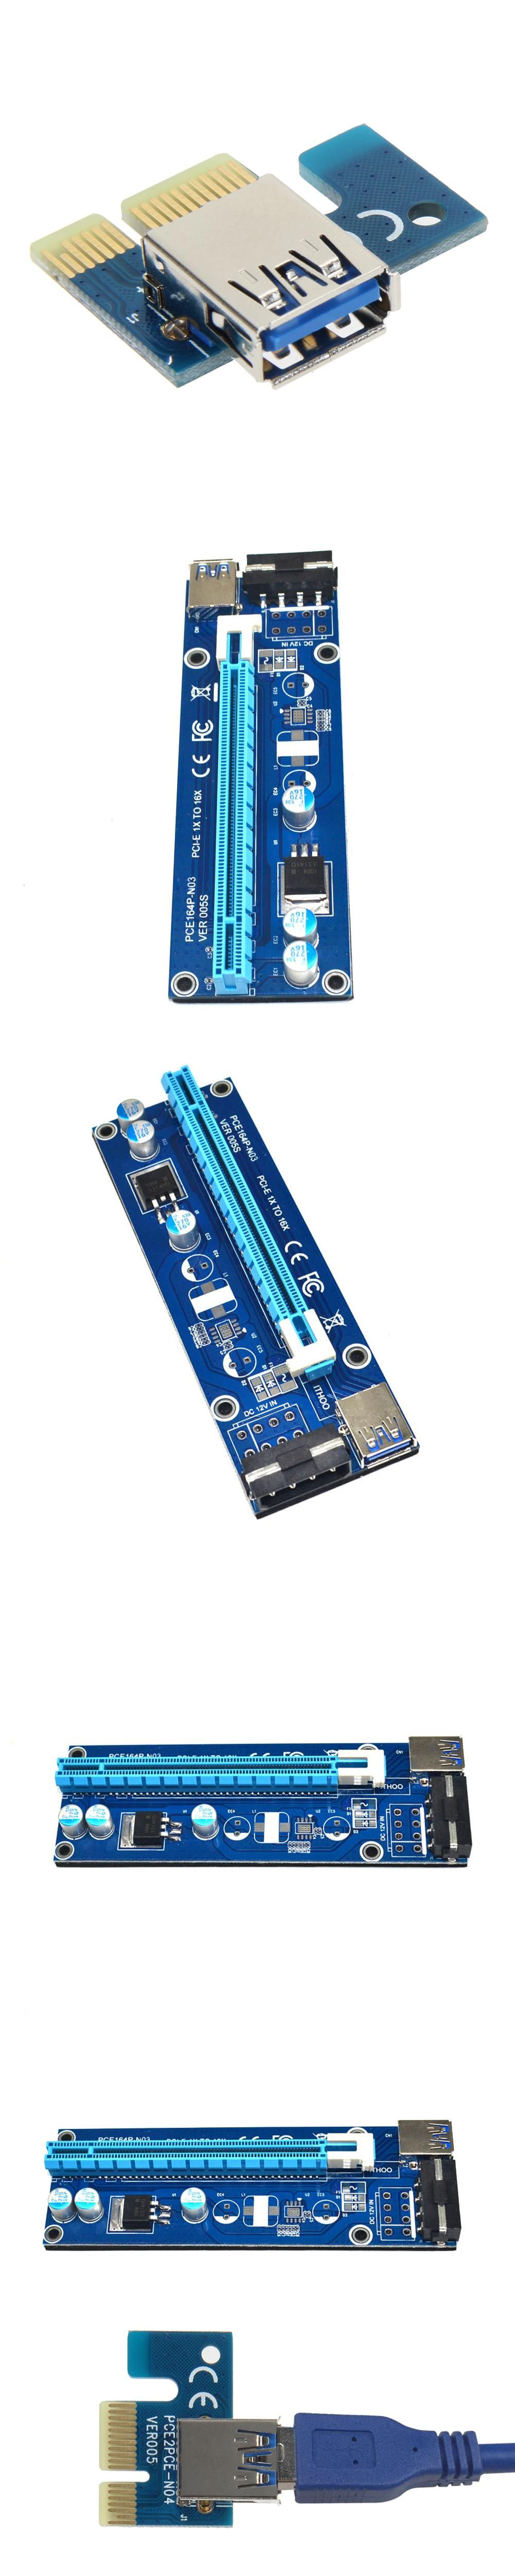 PCIe PCI-E PCI Express Riser Card 1x to 16x USB 3.0 Data Cable SATA ...